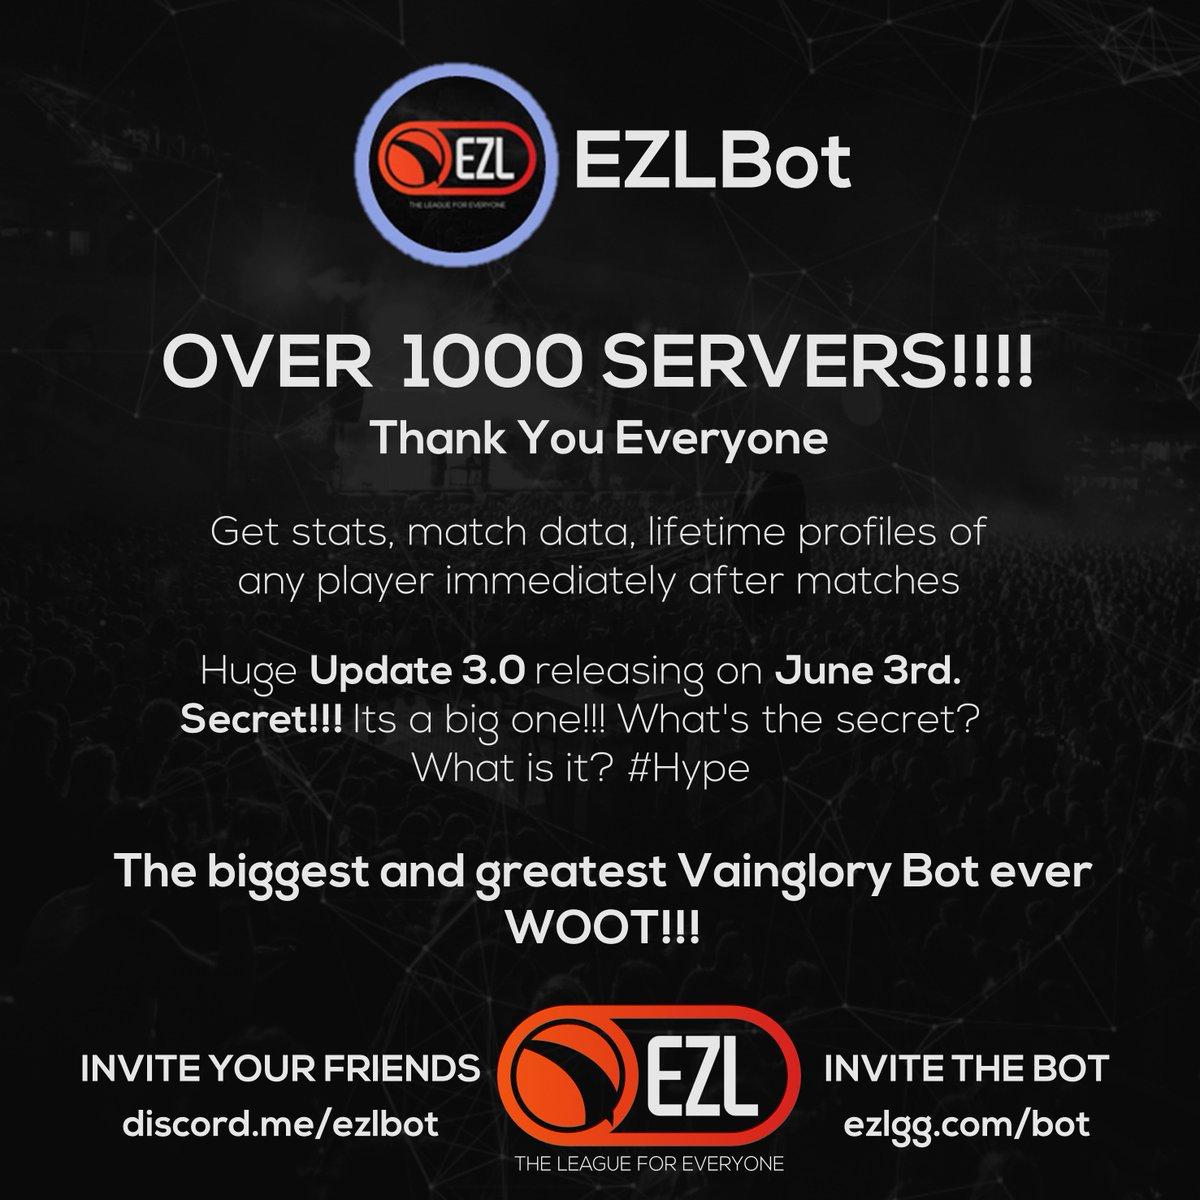 Biggest discord servers